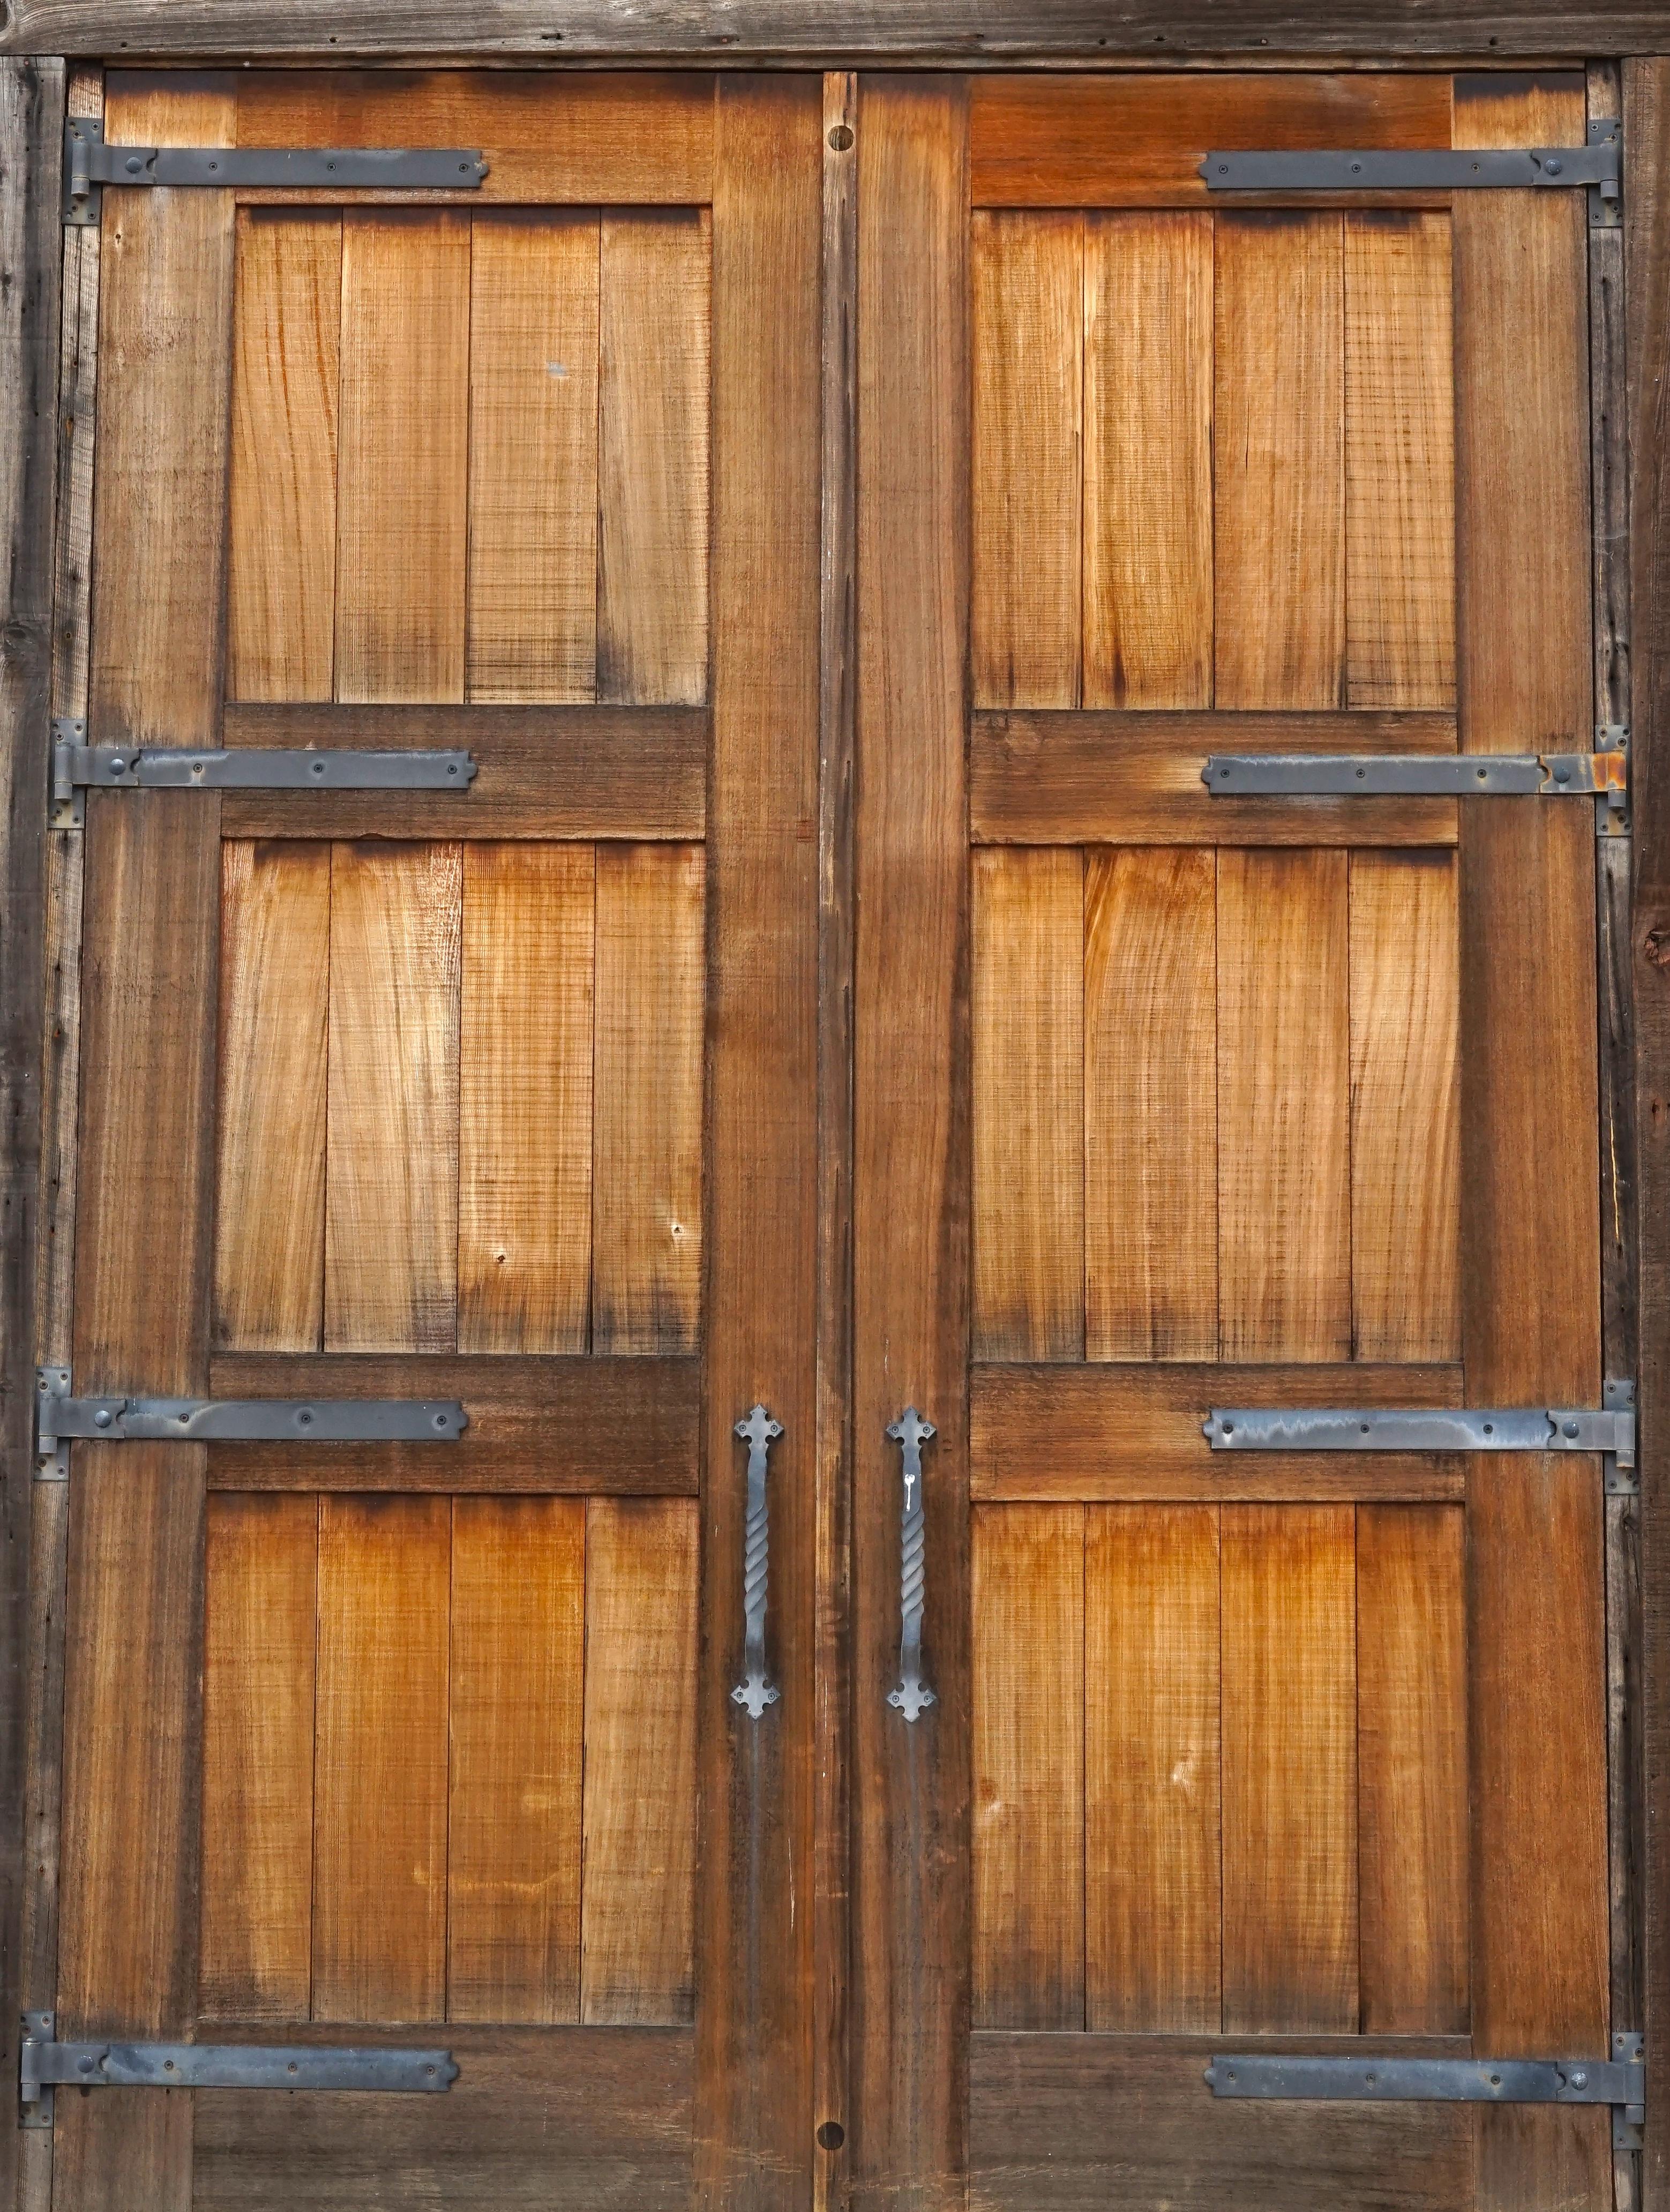 Fotos gratis : arquitectura, edificio, almacenar, Entrada, estante ...